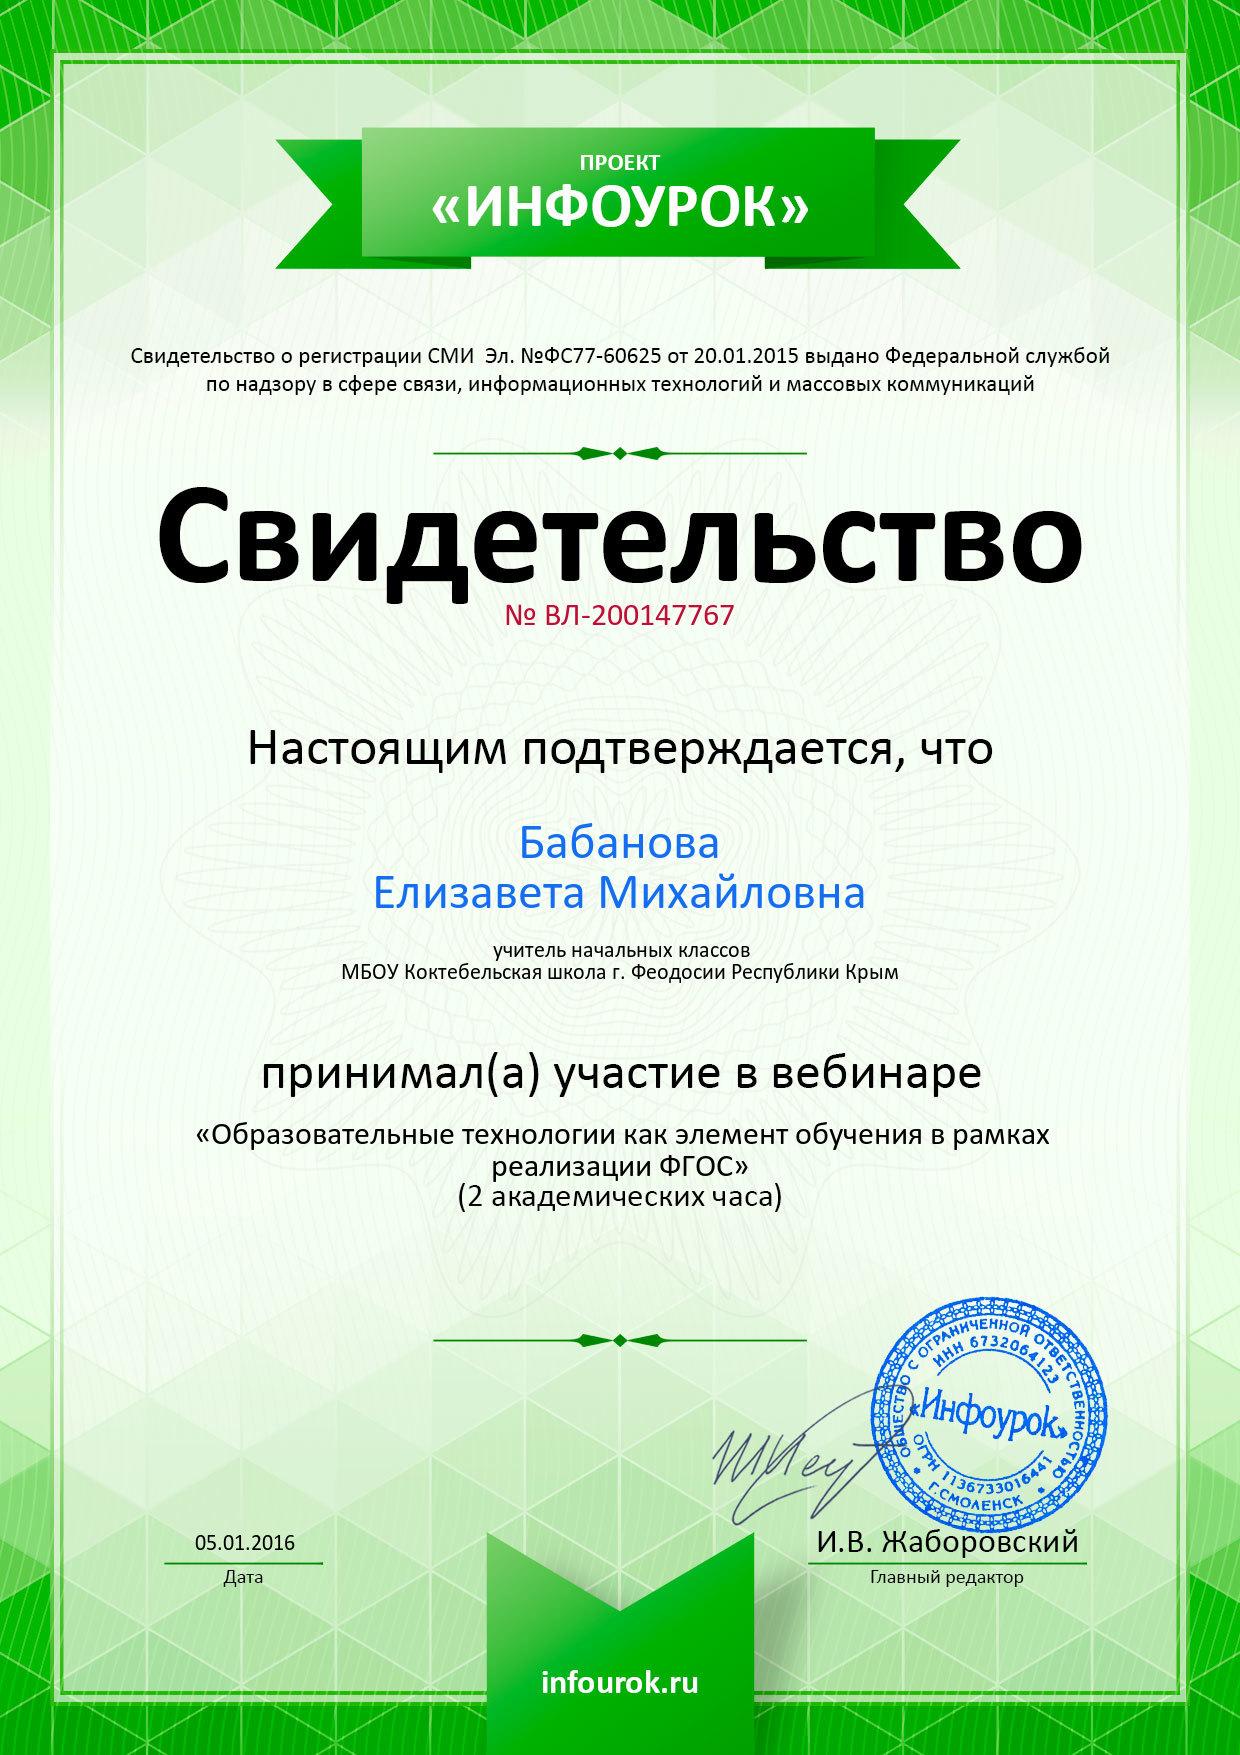 C:\Users\Elizaveta\Desktop\аттестация Бабанова\Лиза сертификаты\Свидетельство проекта infourok.ru № ВЛ-200147767.jpg